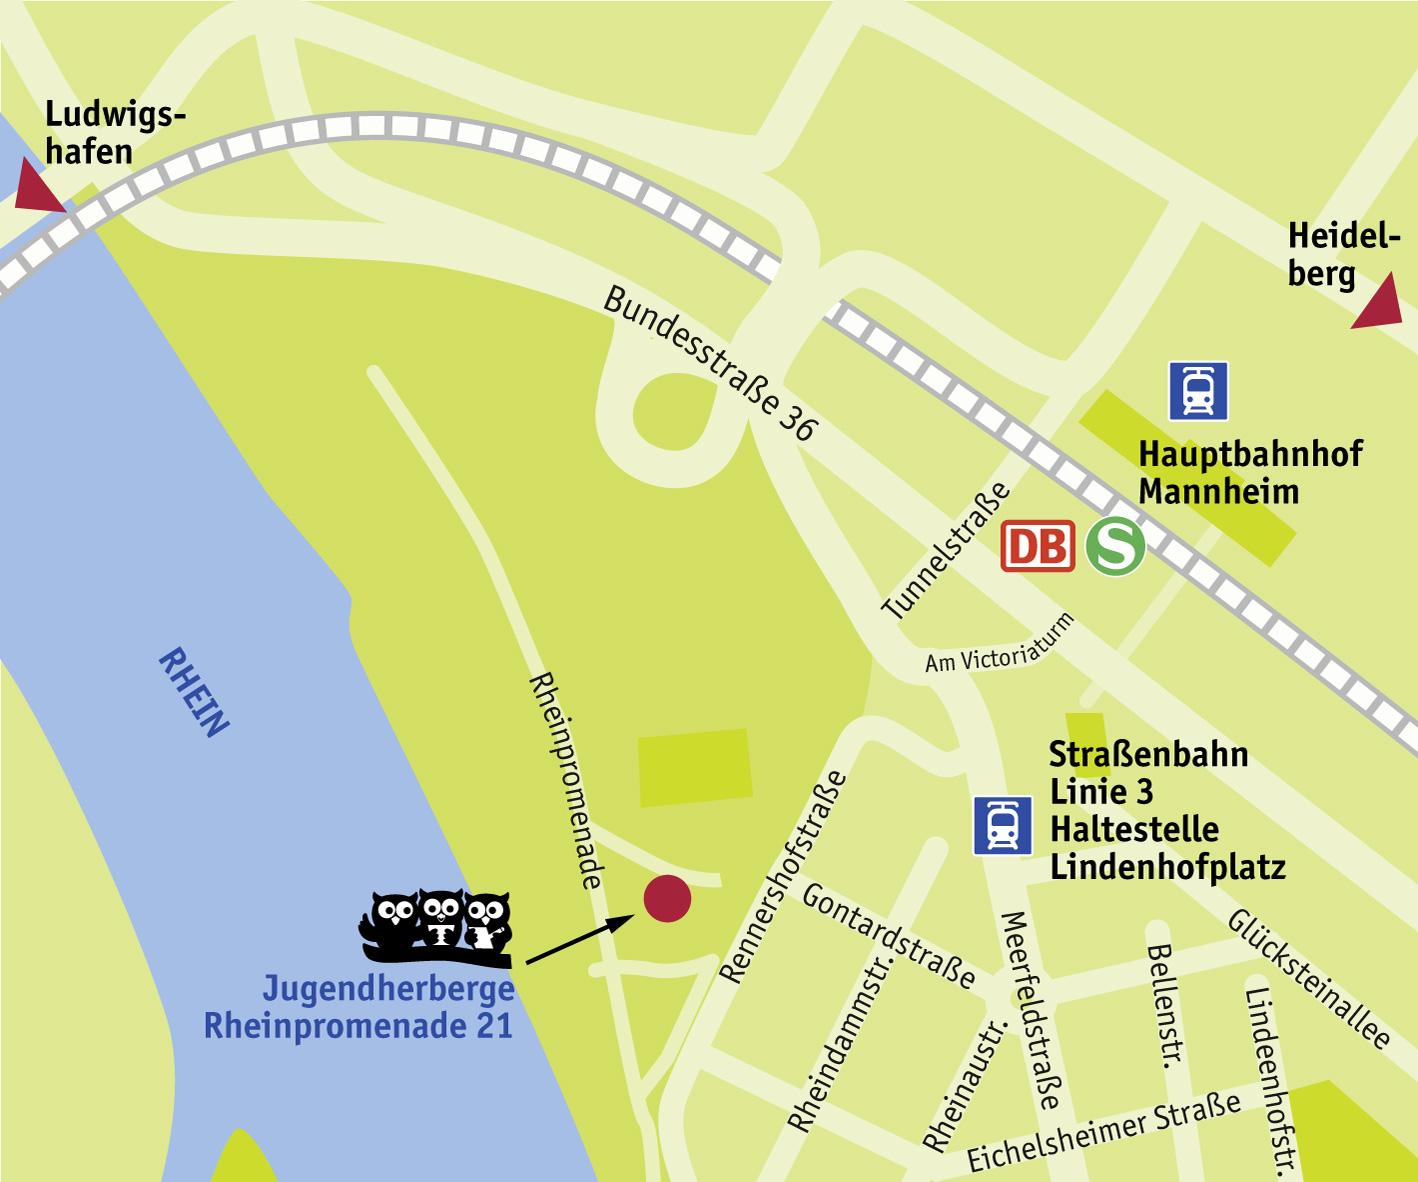 MannheimNEU